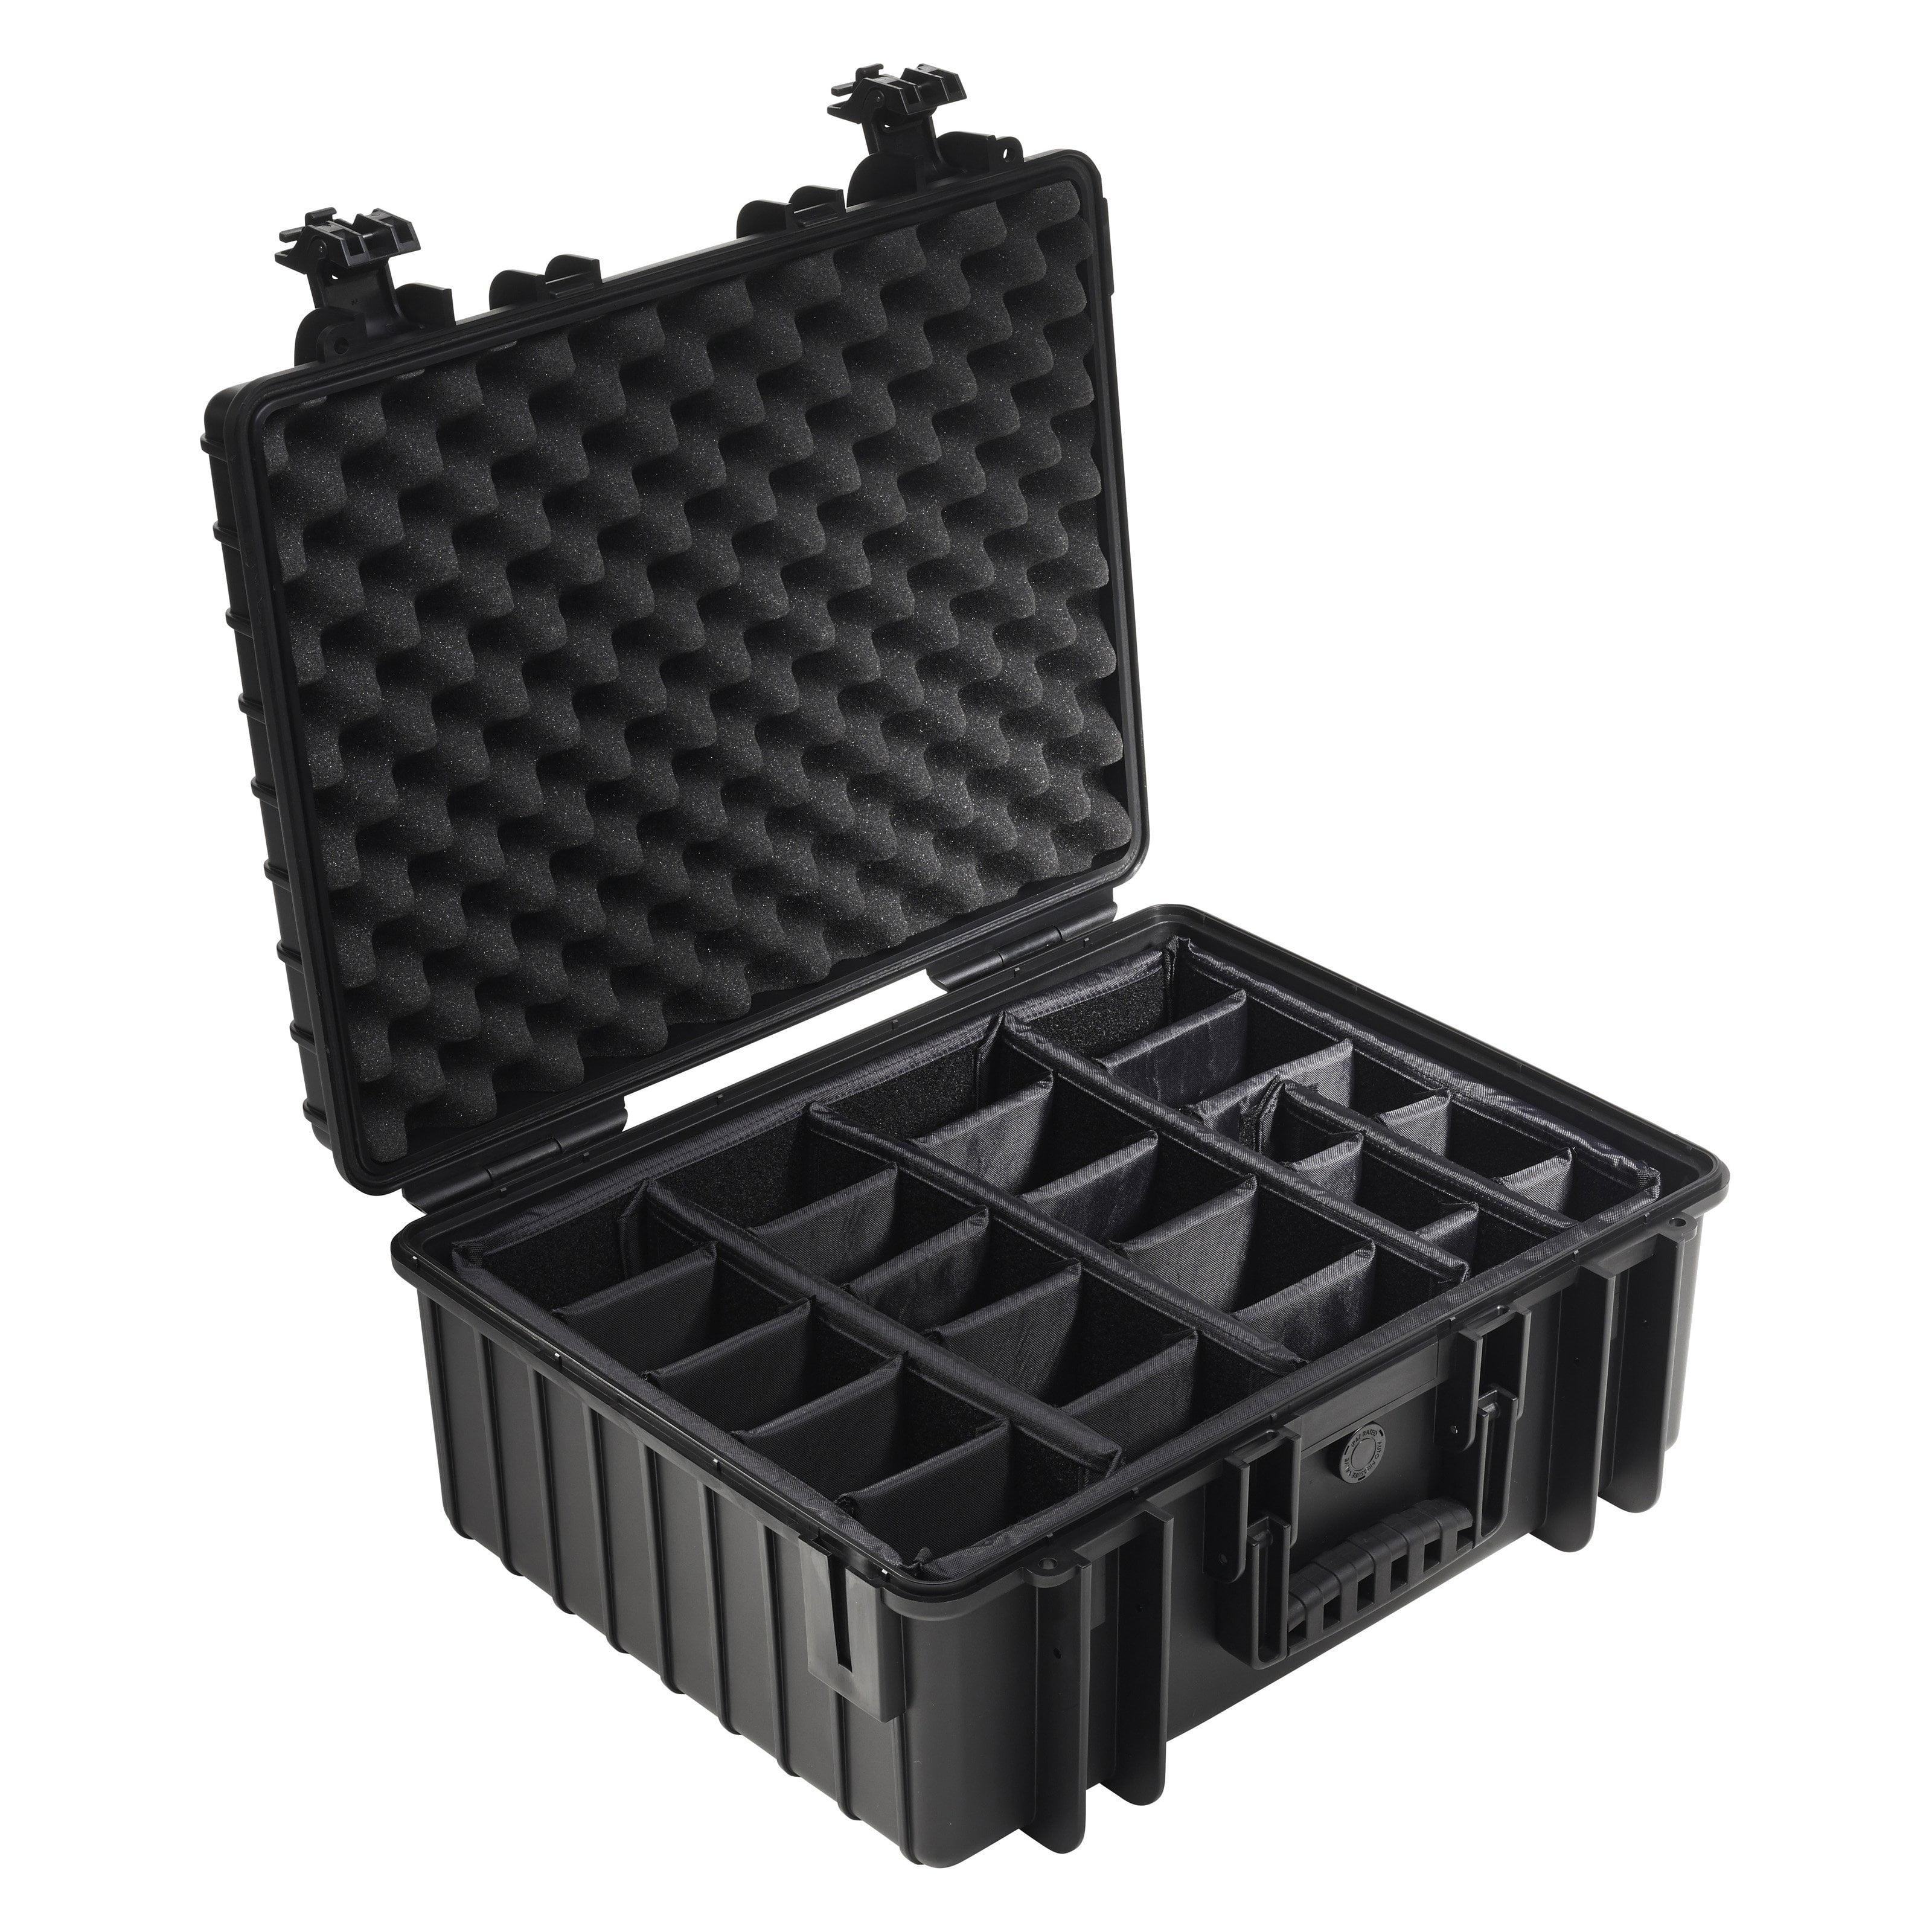 B and W Type 6000 Waterproof Outdoor Storage Case